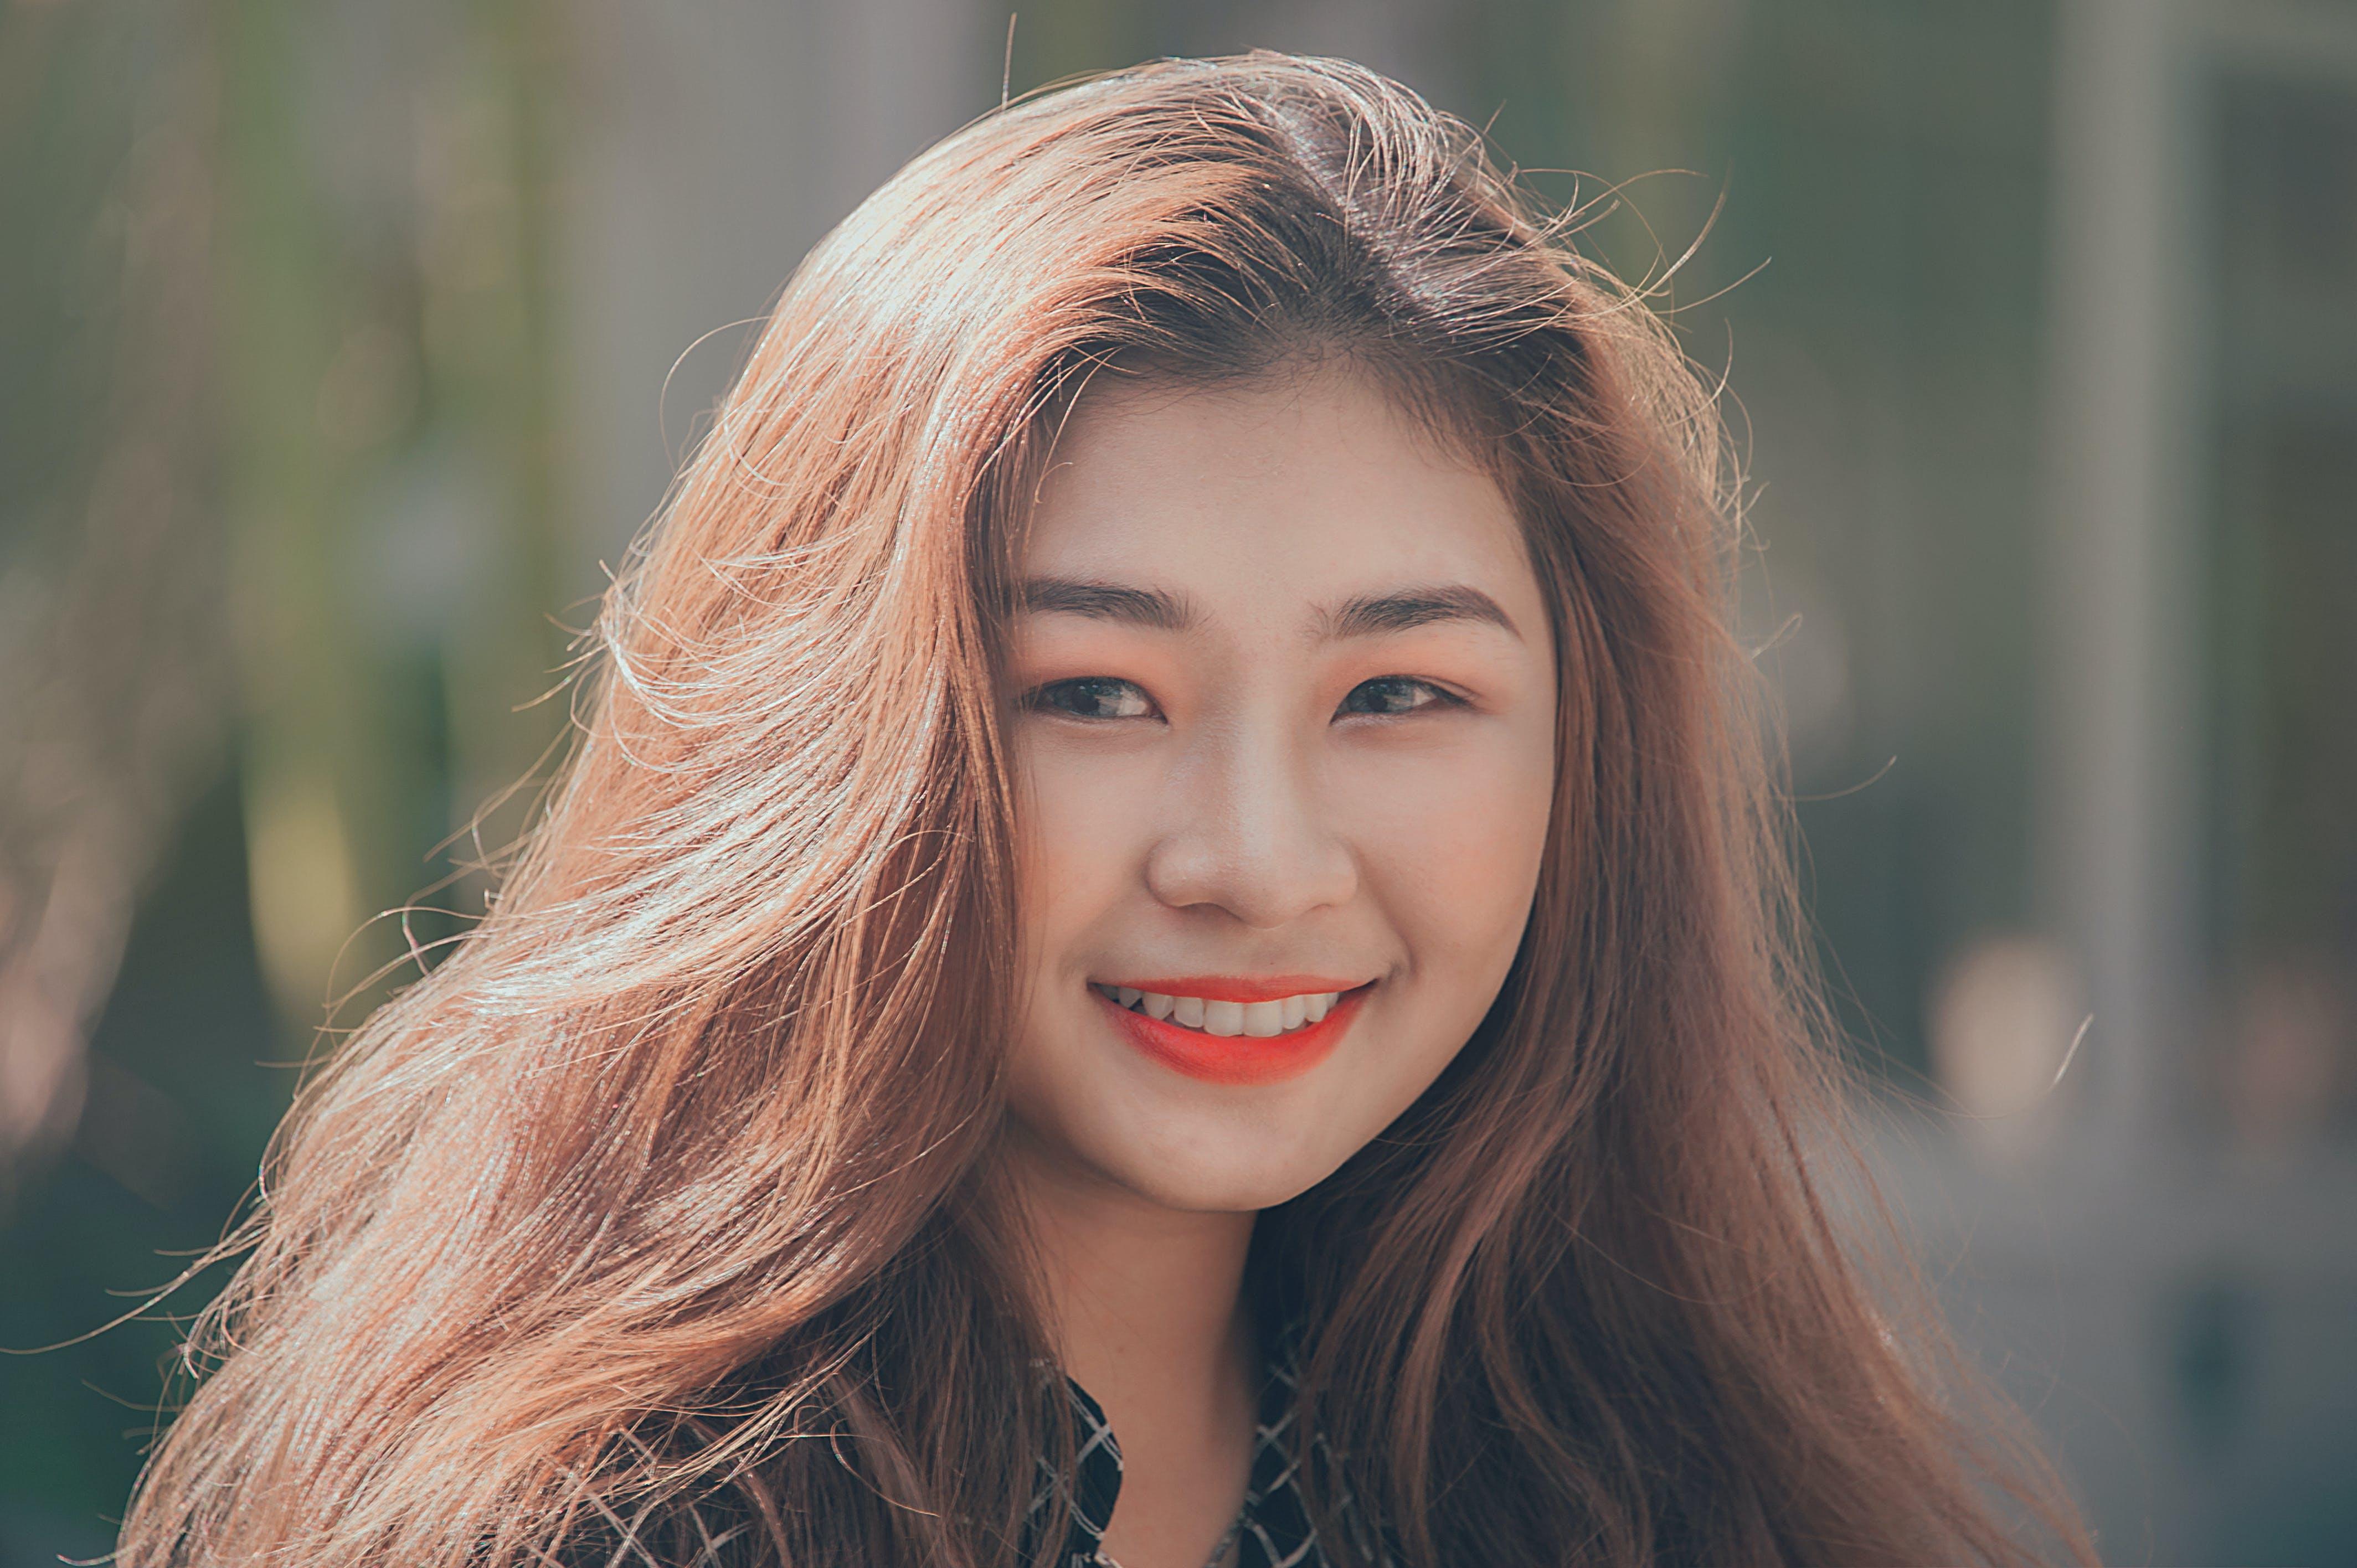 Woman Smiling Wearing Red Lipstick